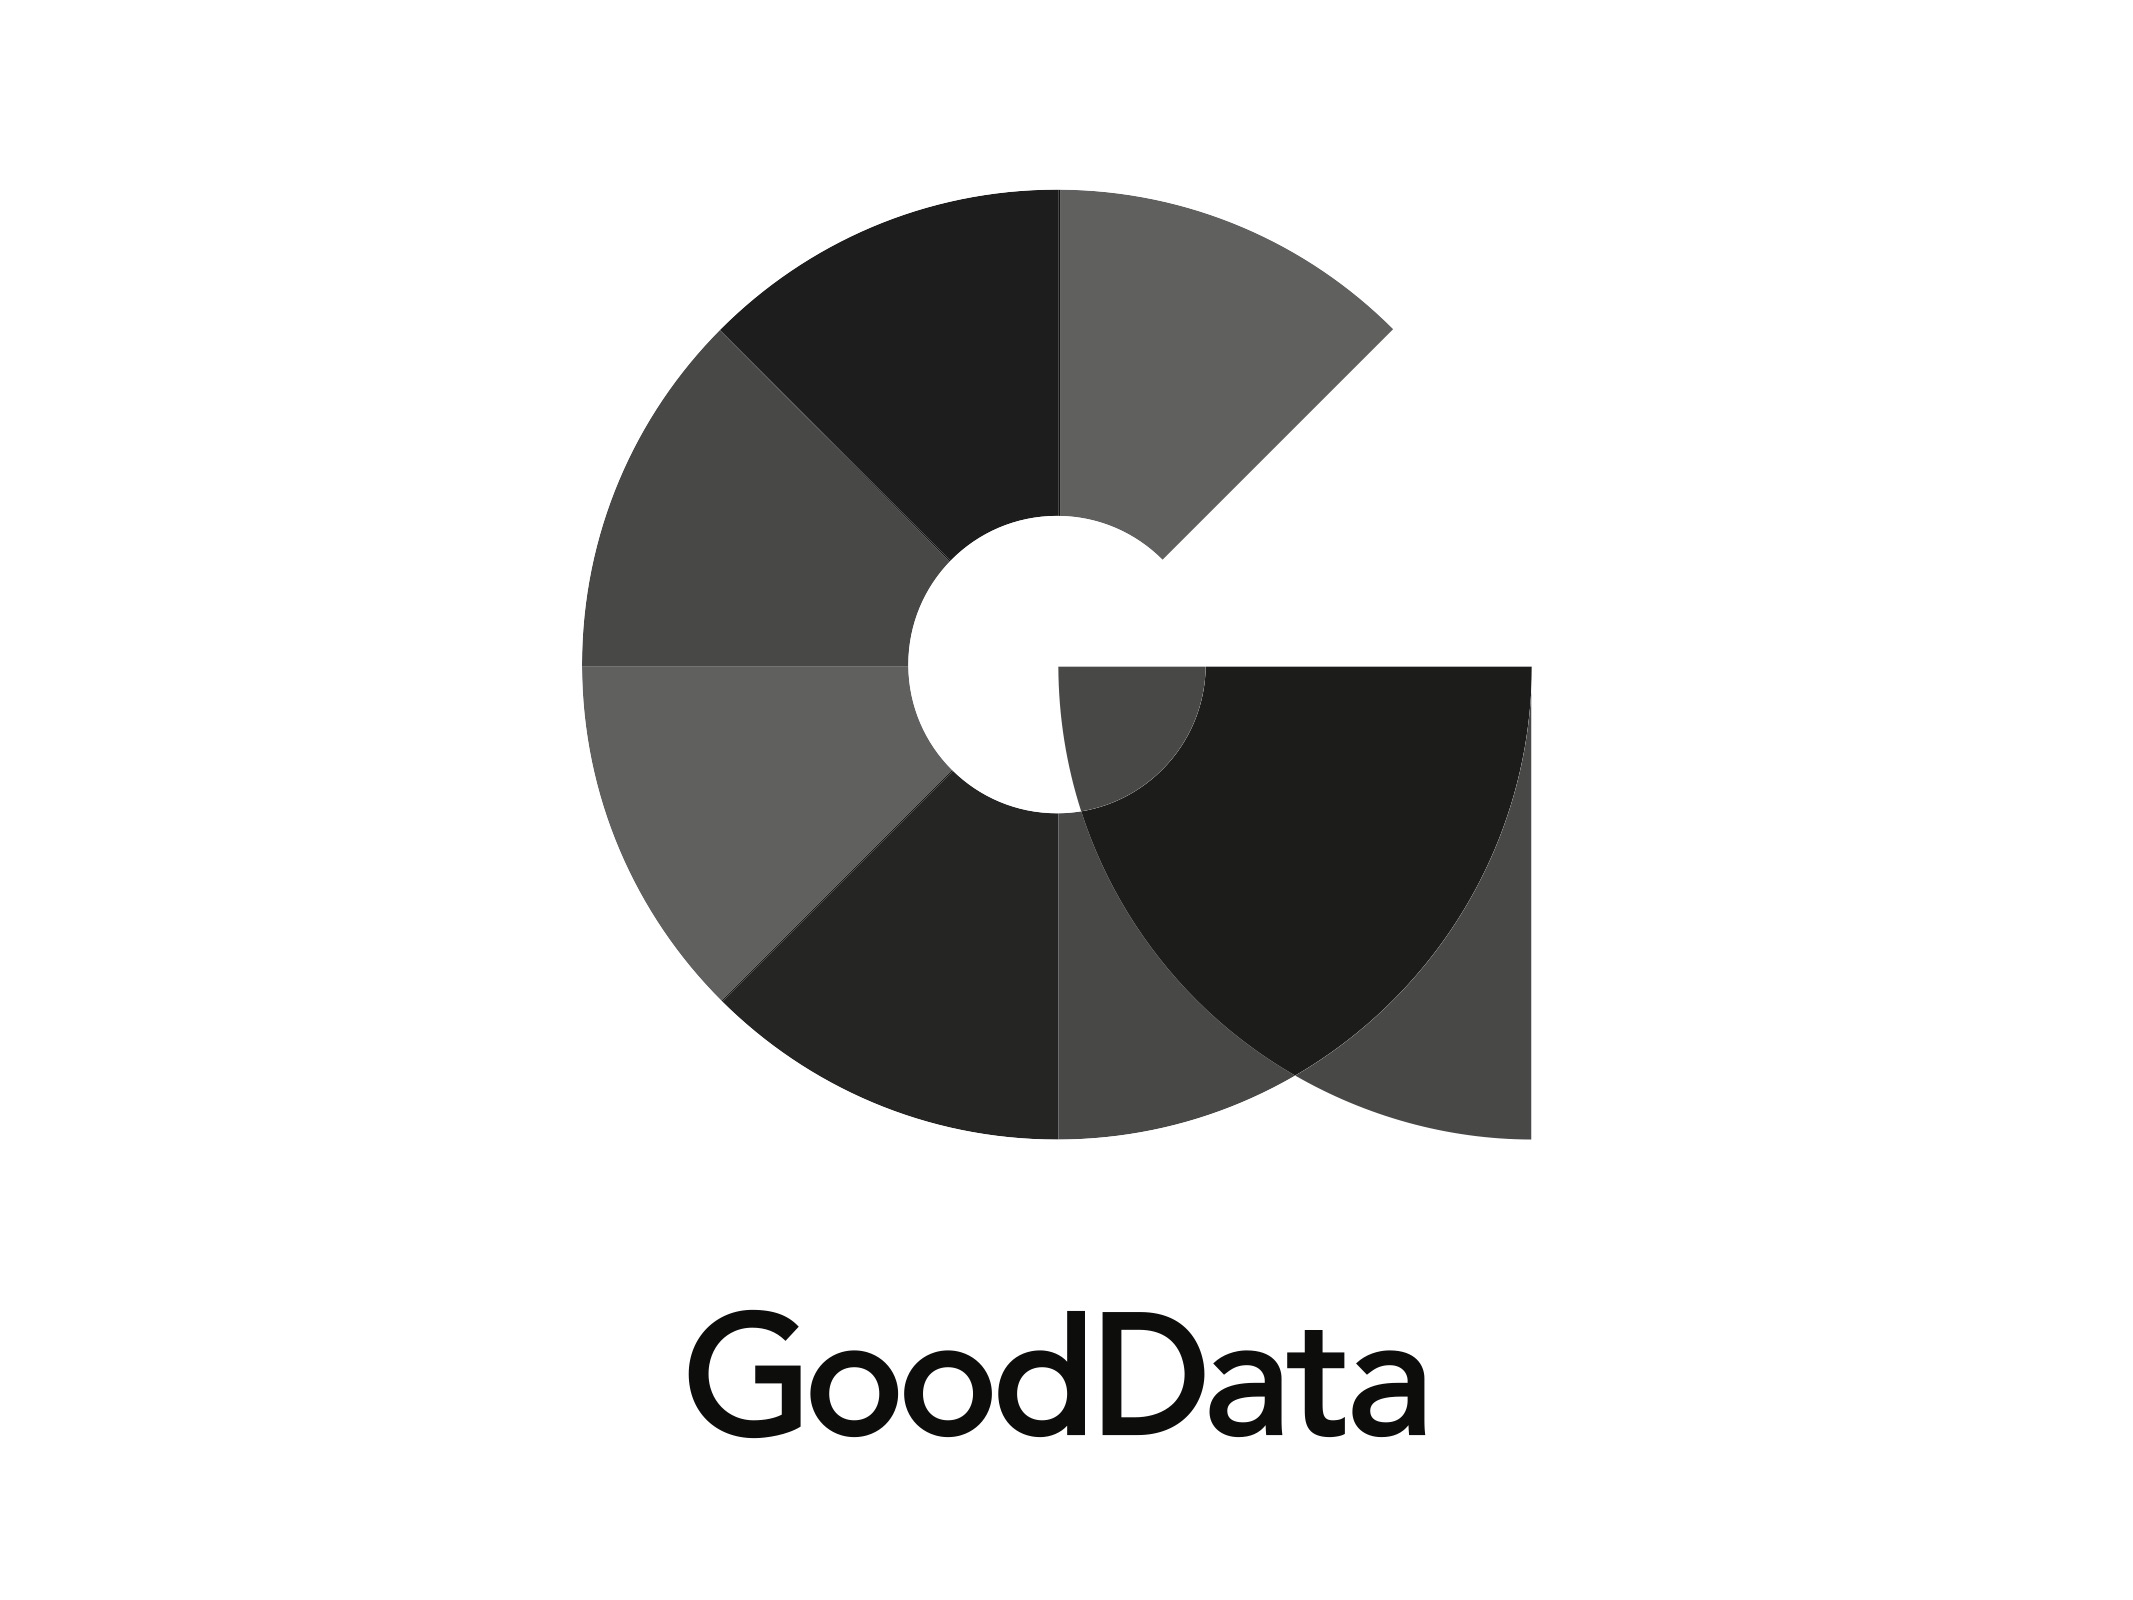 GoodData nedir